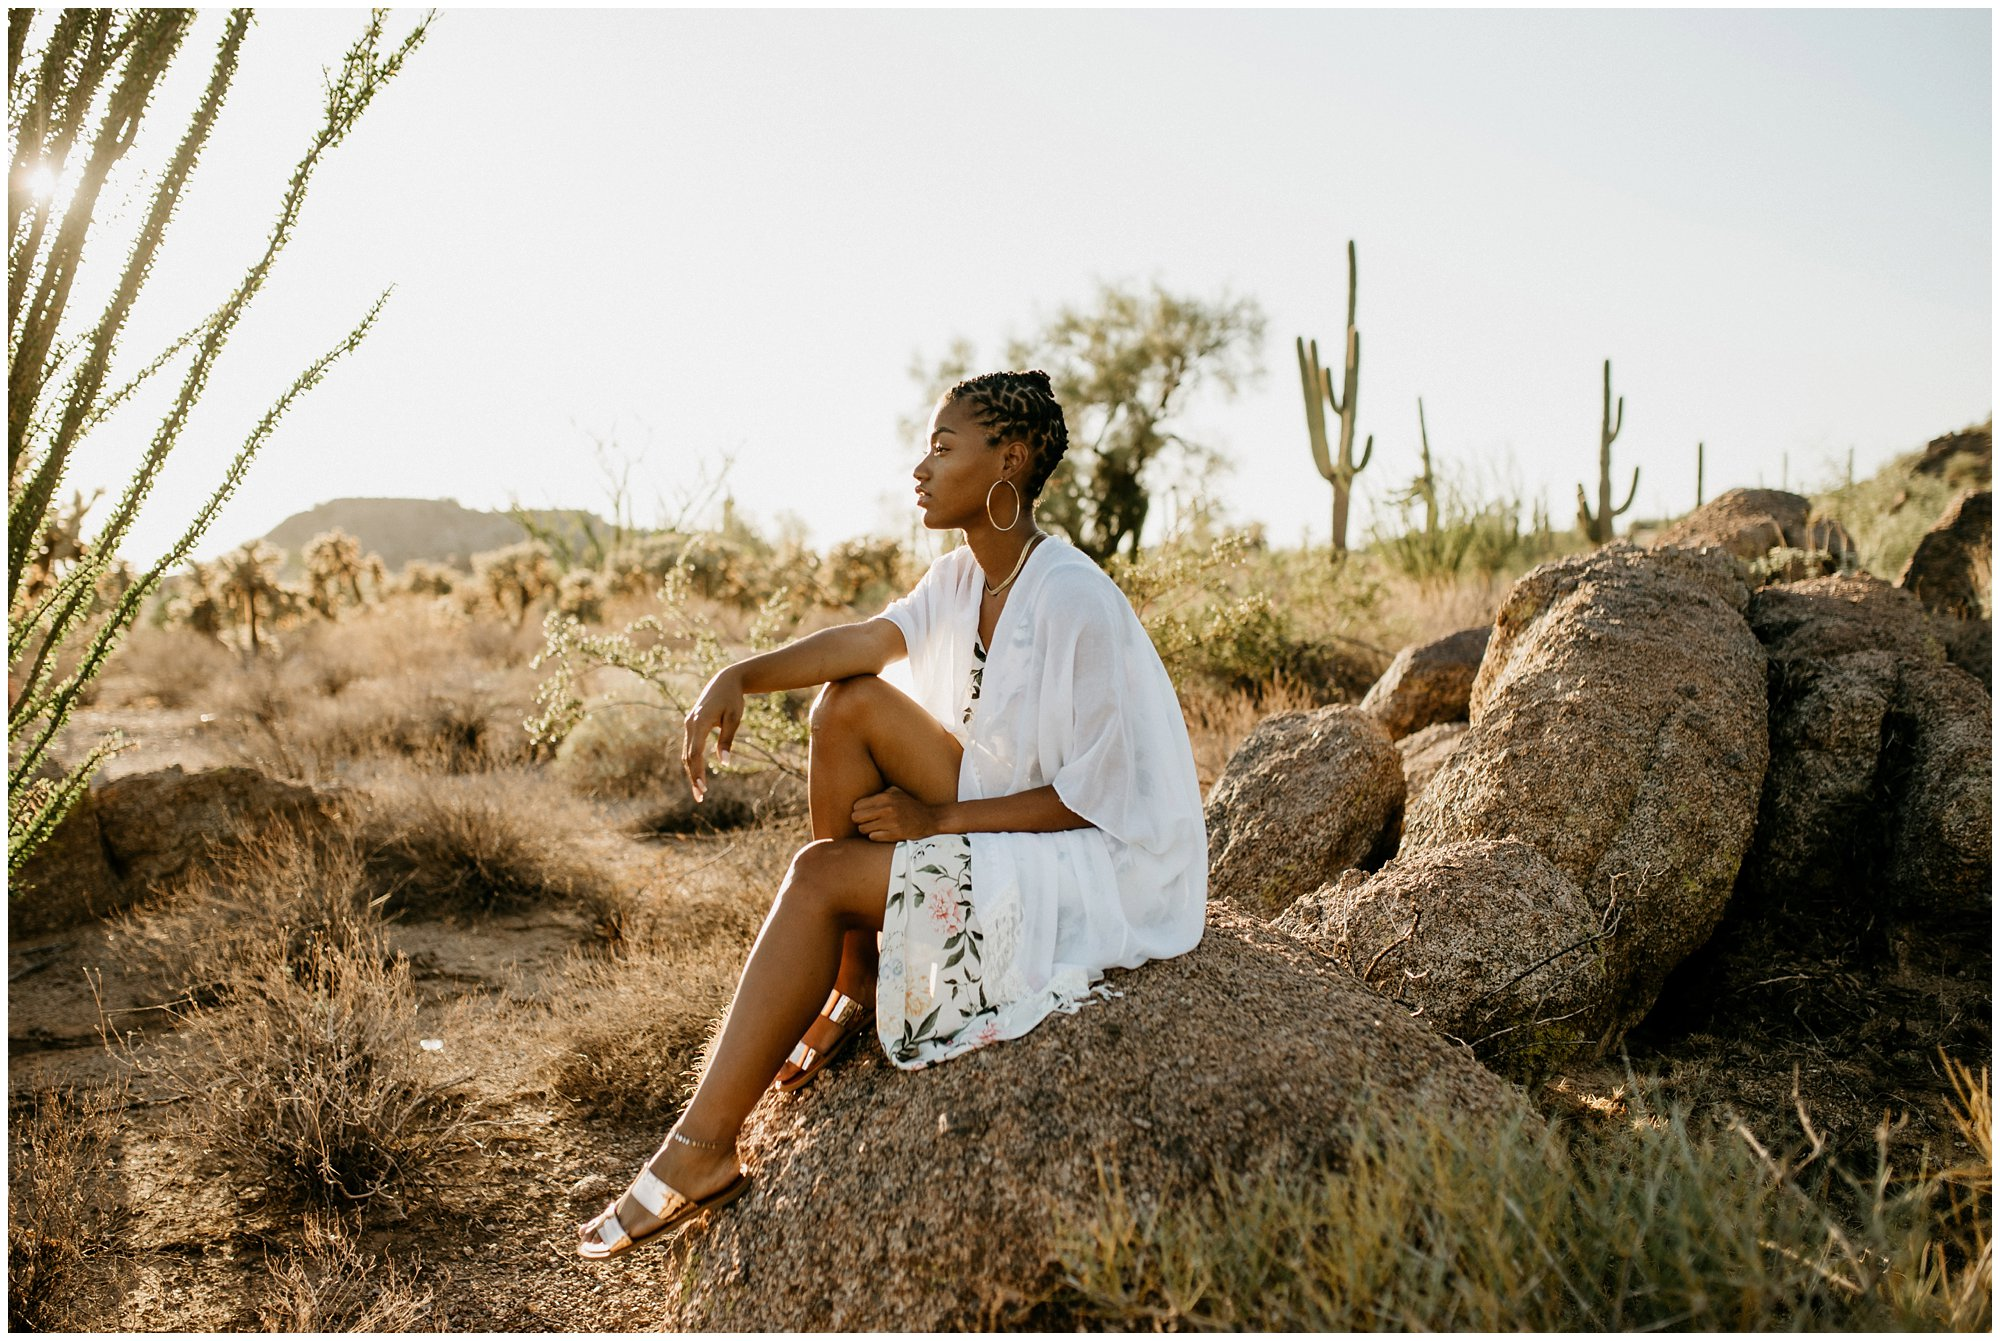 Desert Model Portrait Session - Ashtyn Nicole Photo_0008.jpg